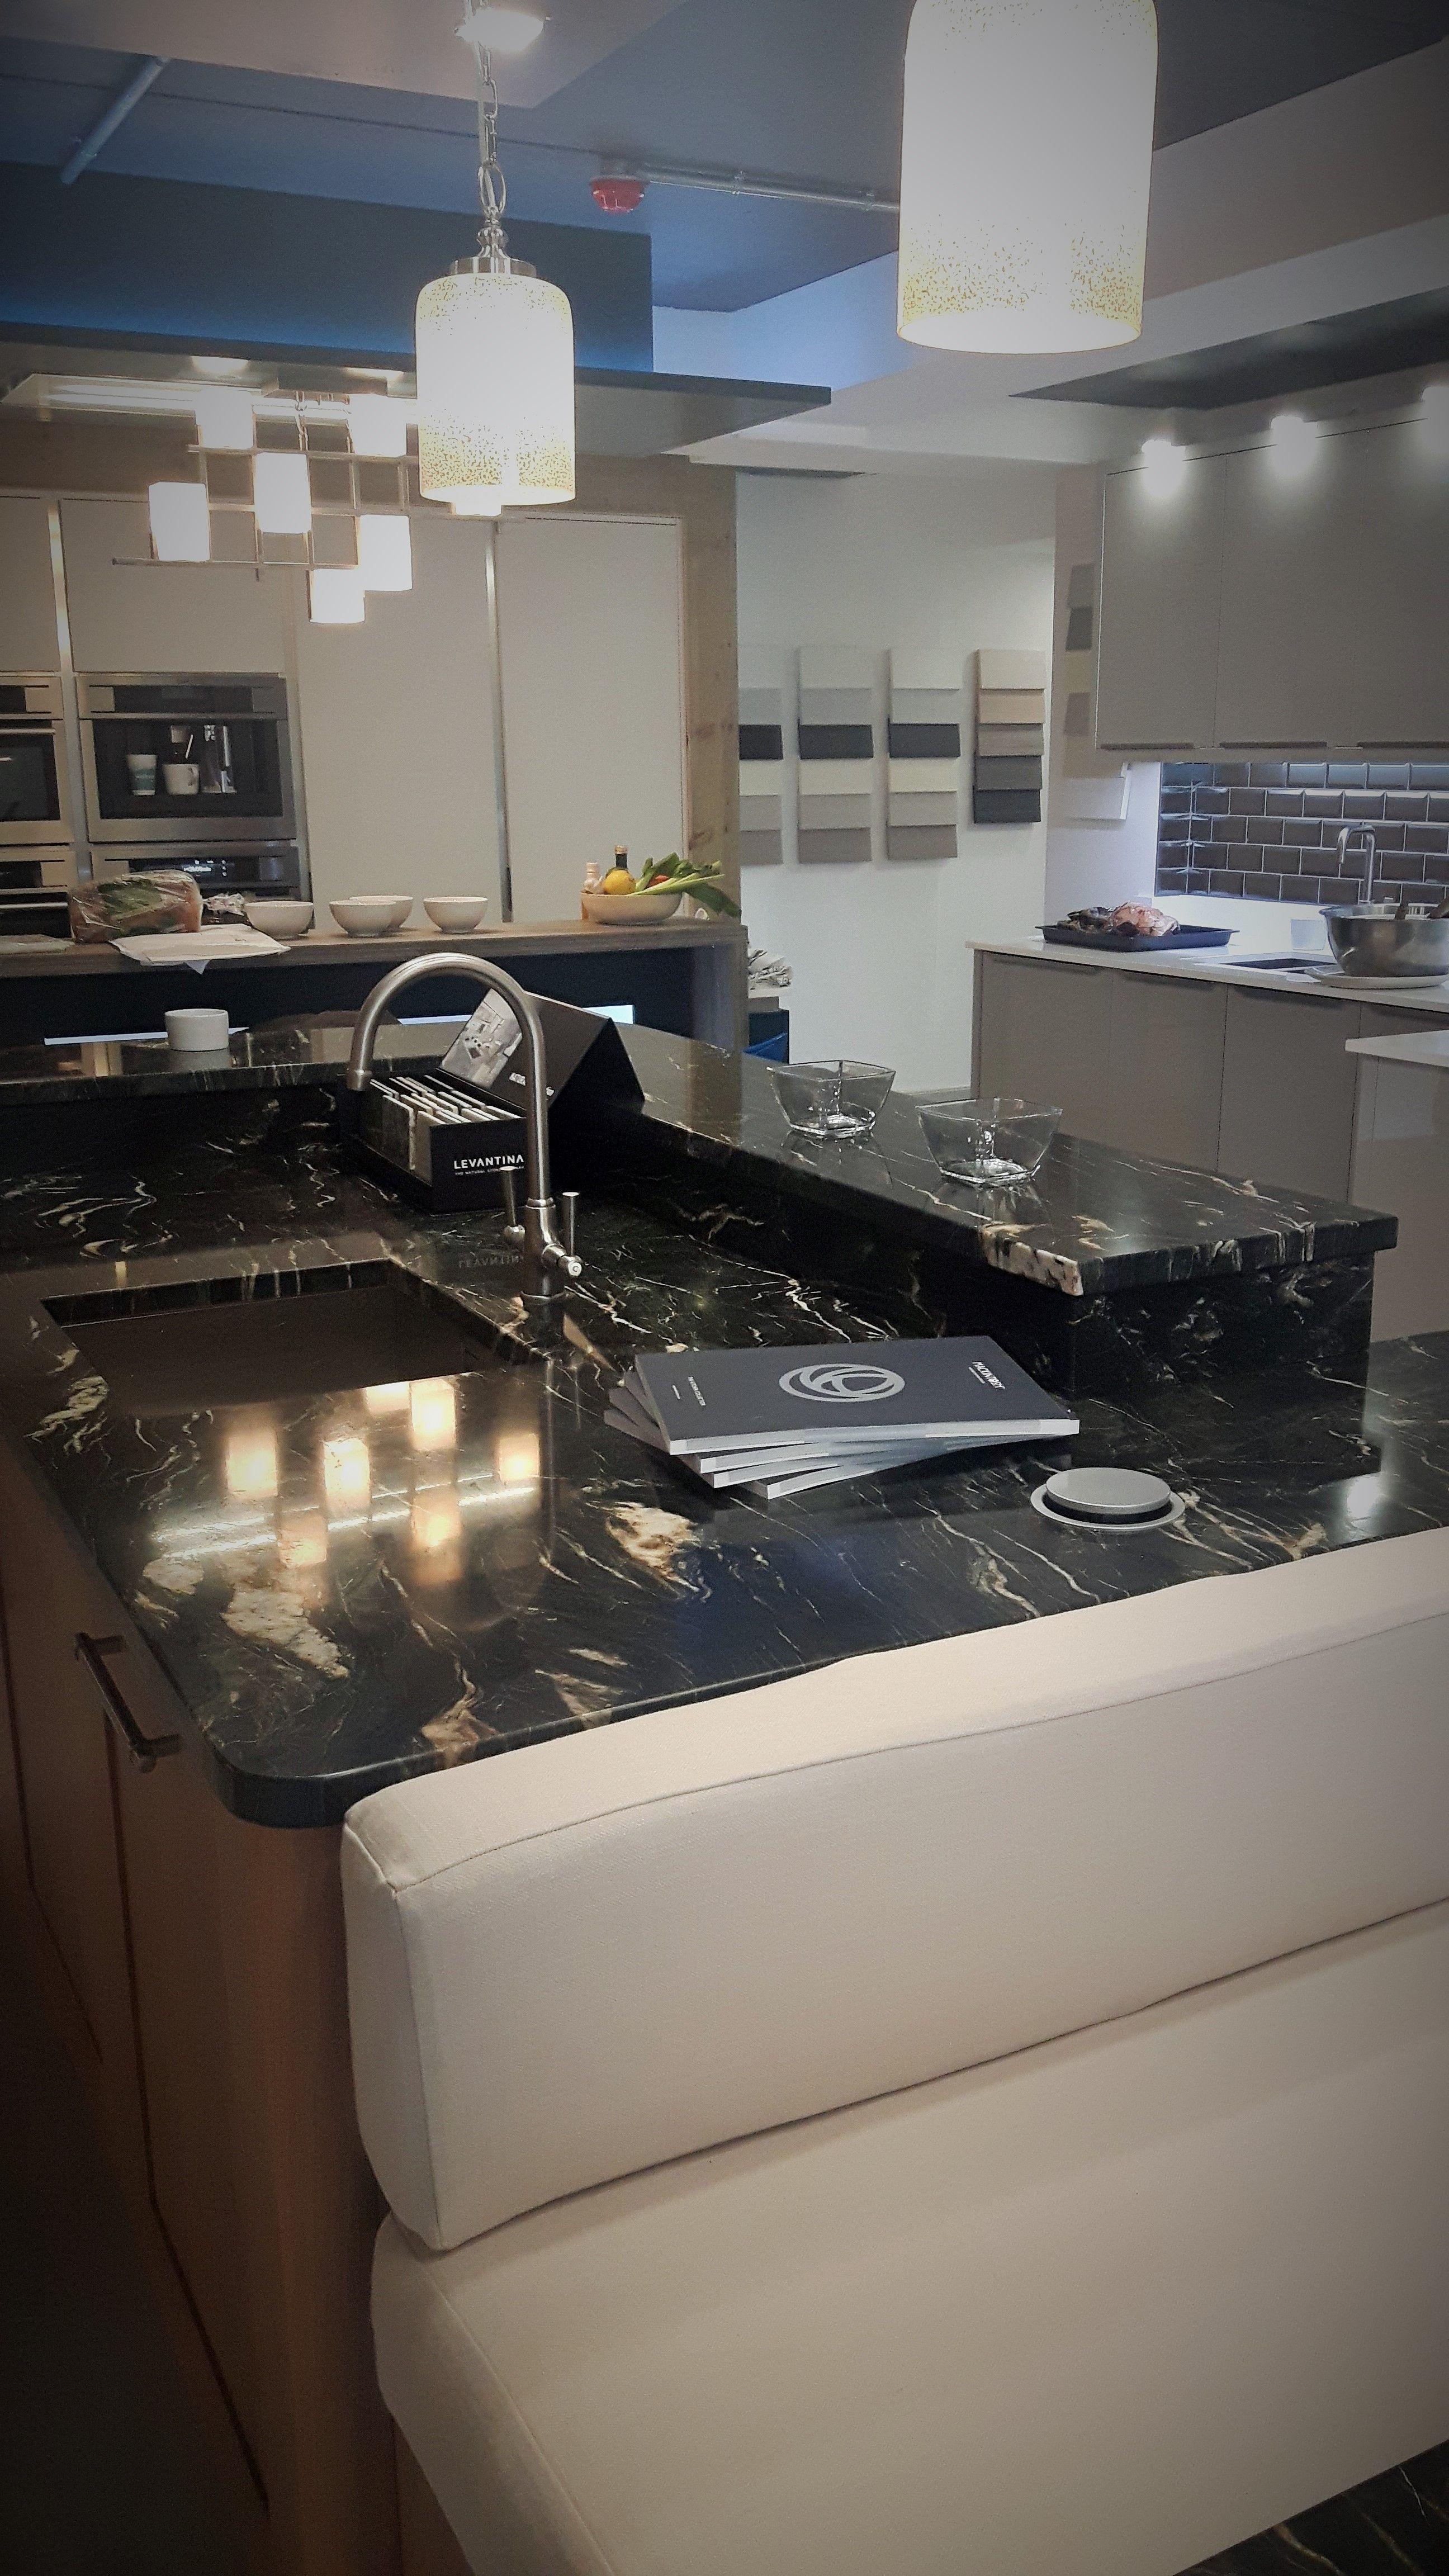 of alaska some item premium good countertops cm naples with img work tampa fl see our granite